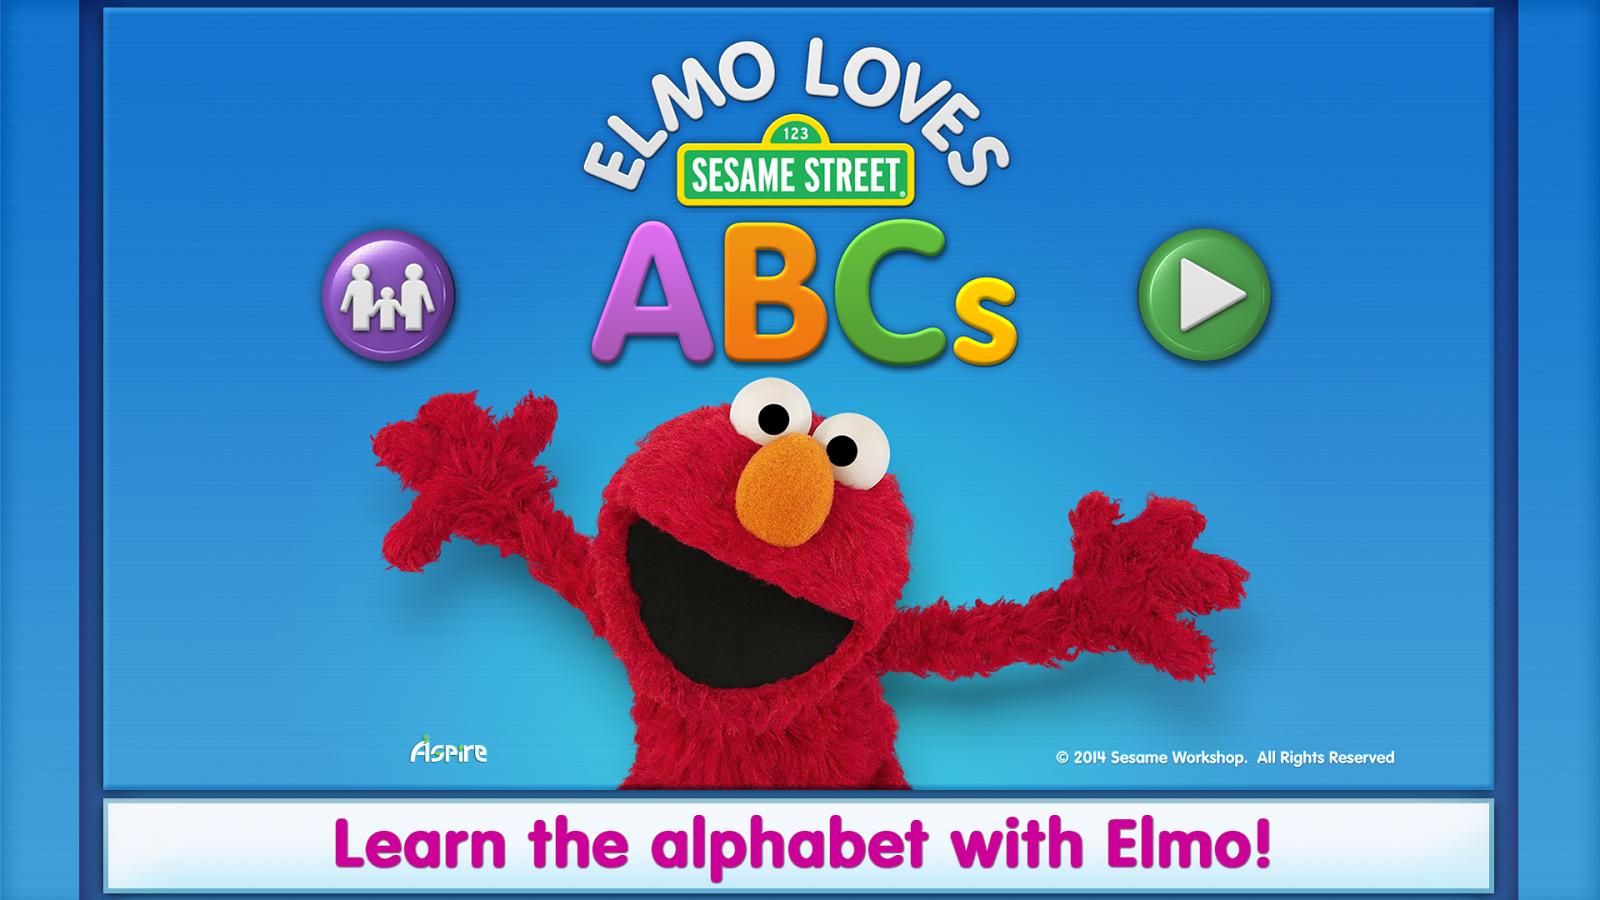 Elmo loves abcs android apps on google play for Elmo abc